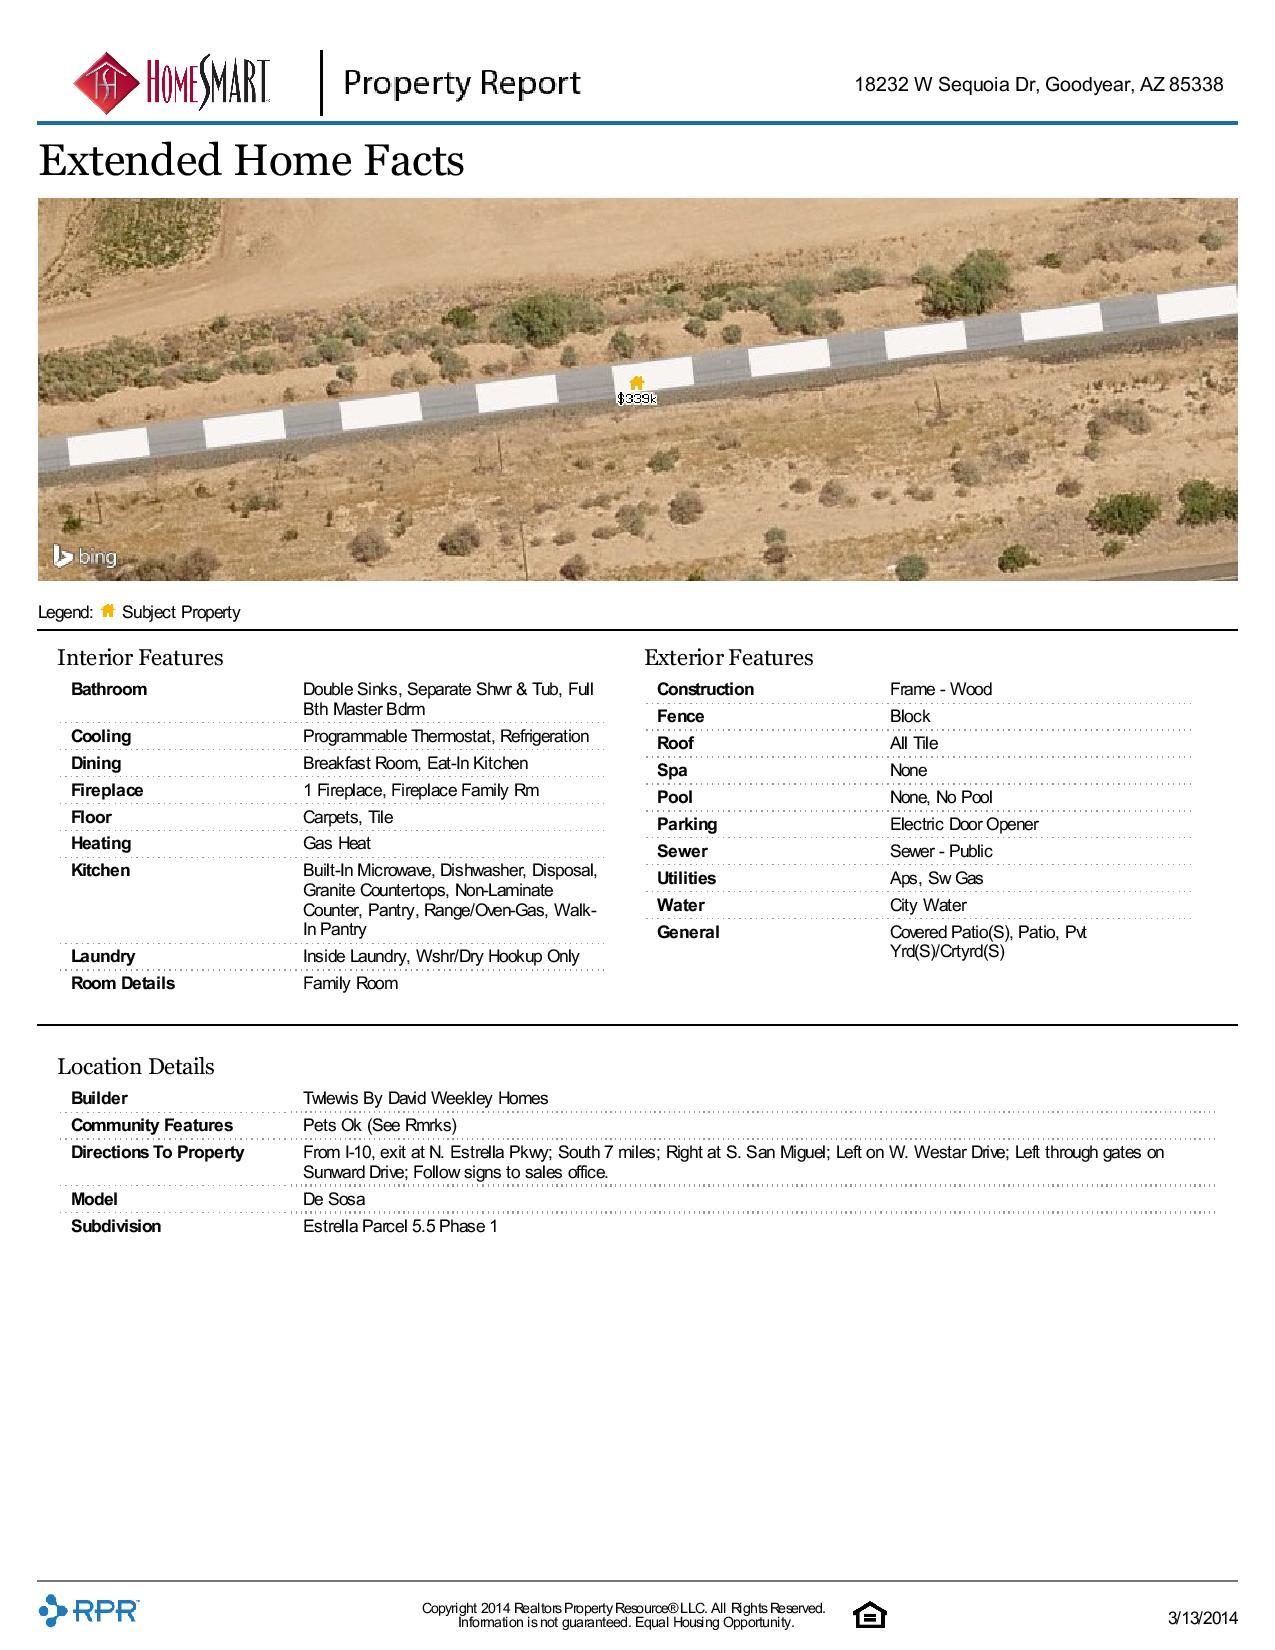 18232-W-Sequoia-Dr-Goodyear-AZ-85338-page-004